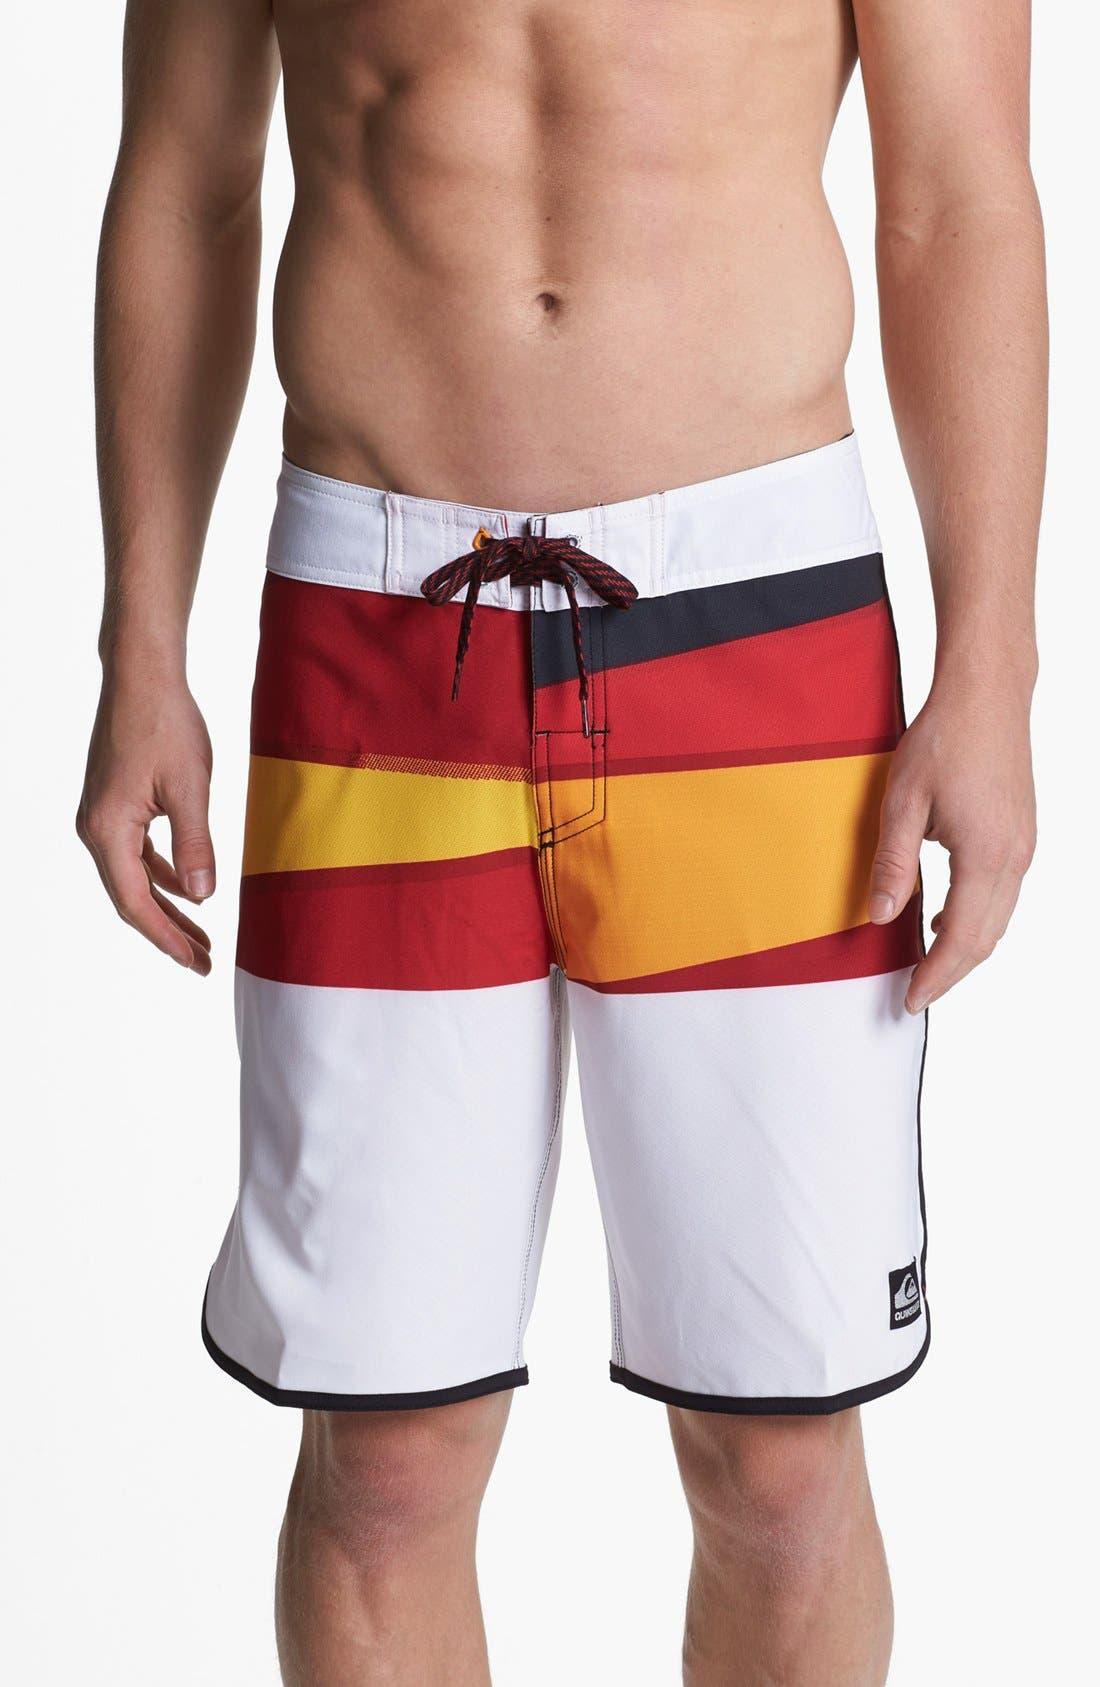 Alternate Image 1 Selected - Quiksilver 'Repel' Board Shorts